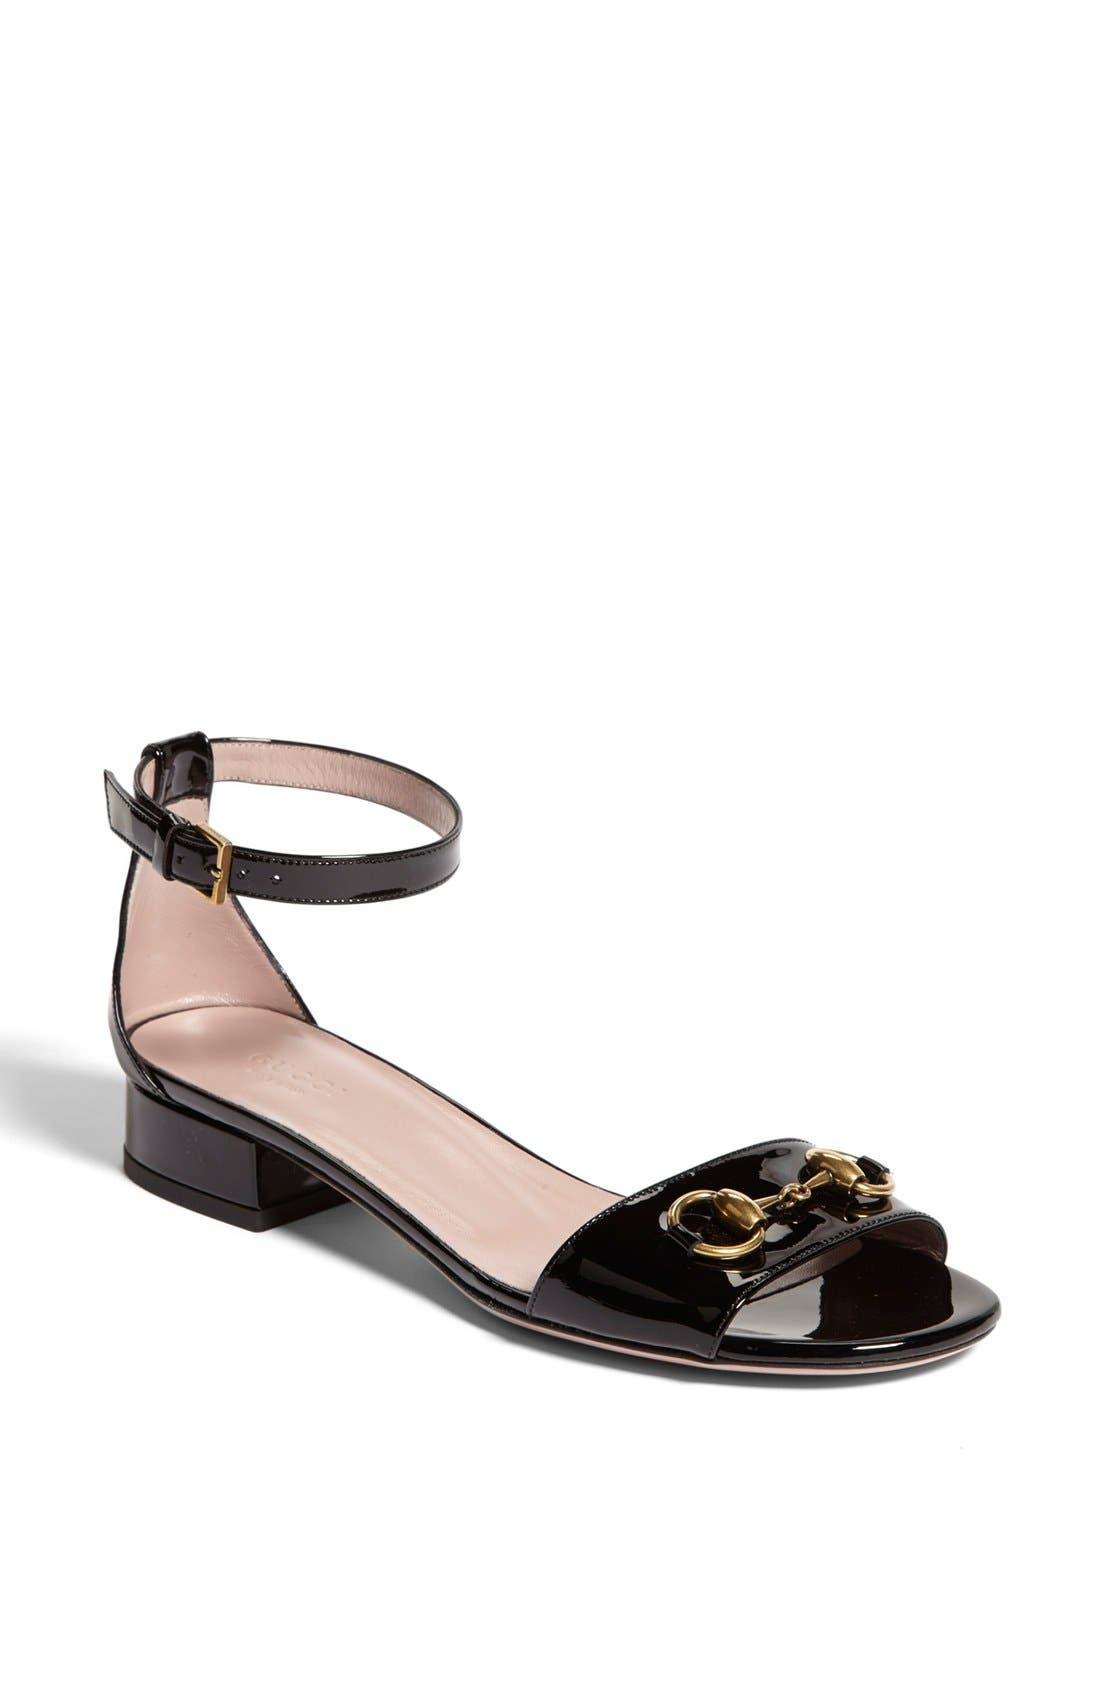 Alternate Image 1 Selected - Gucci 'Liliane' Ankle Strap Sandal